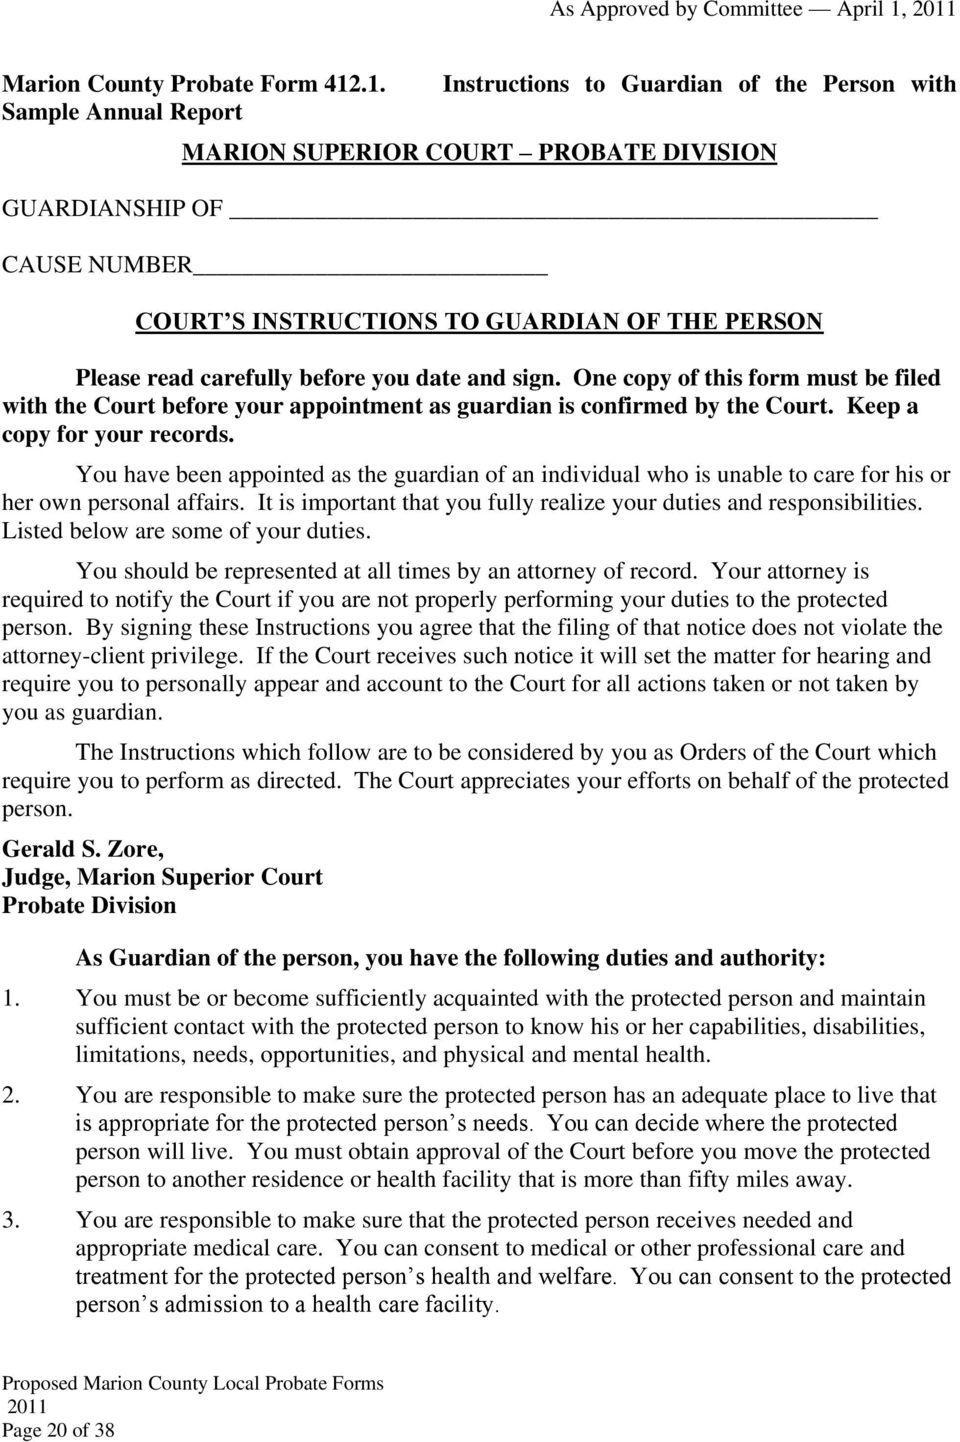 Florida Probate Forms Pdf